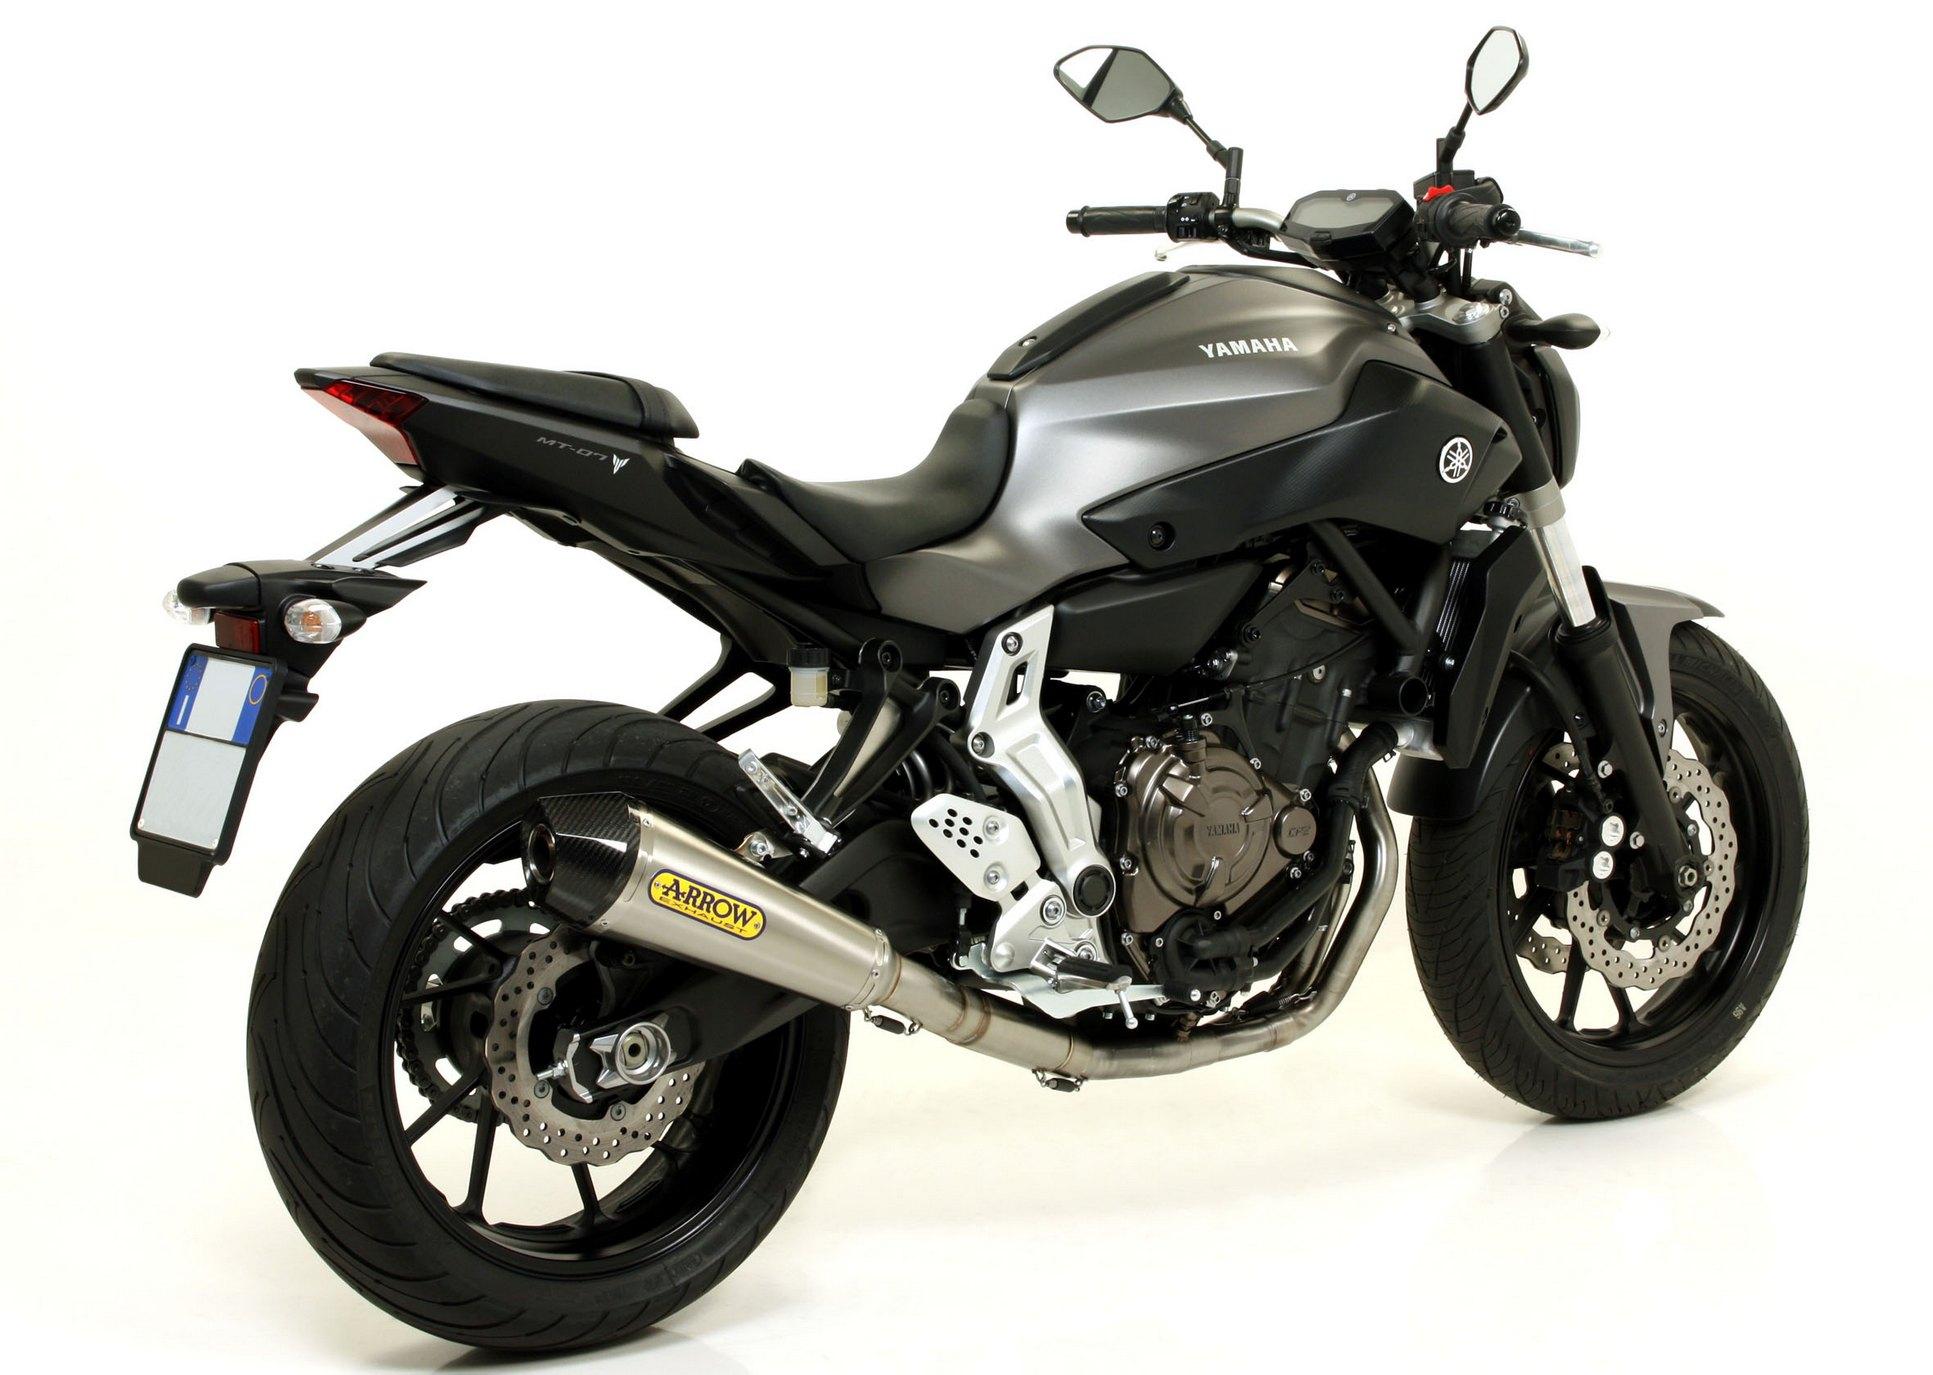 2014 Yamaha MT-07 Receives Arrow Exhaust Upgrades ...